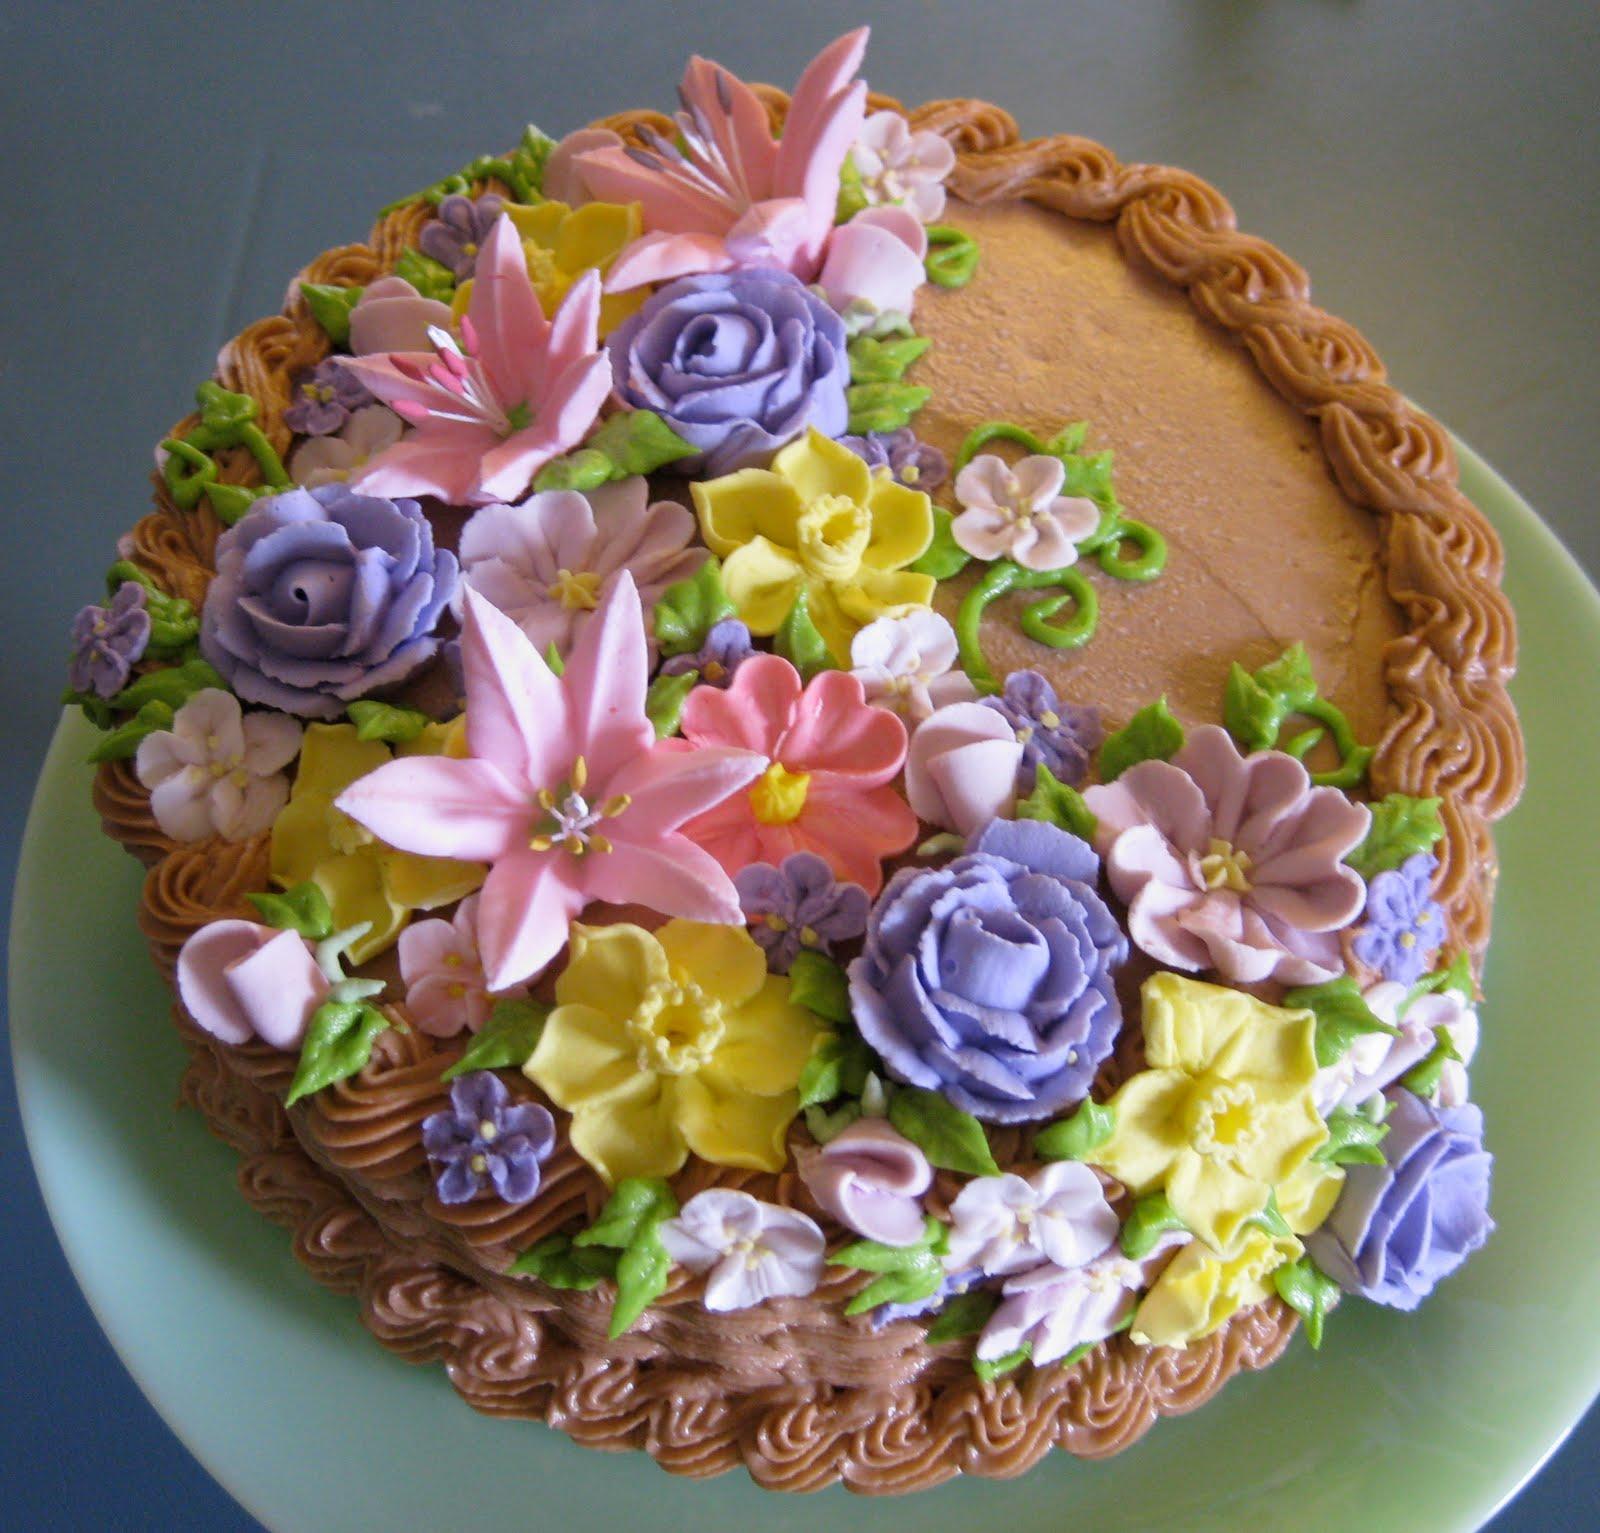 Stuffed Cakes Floral Basket Cake